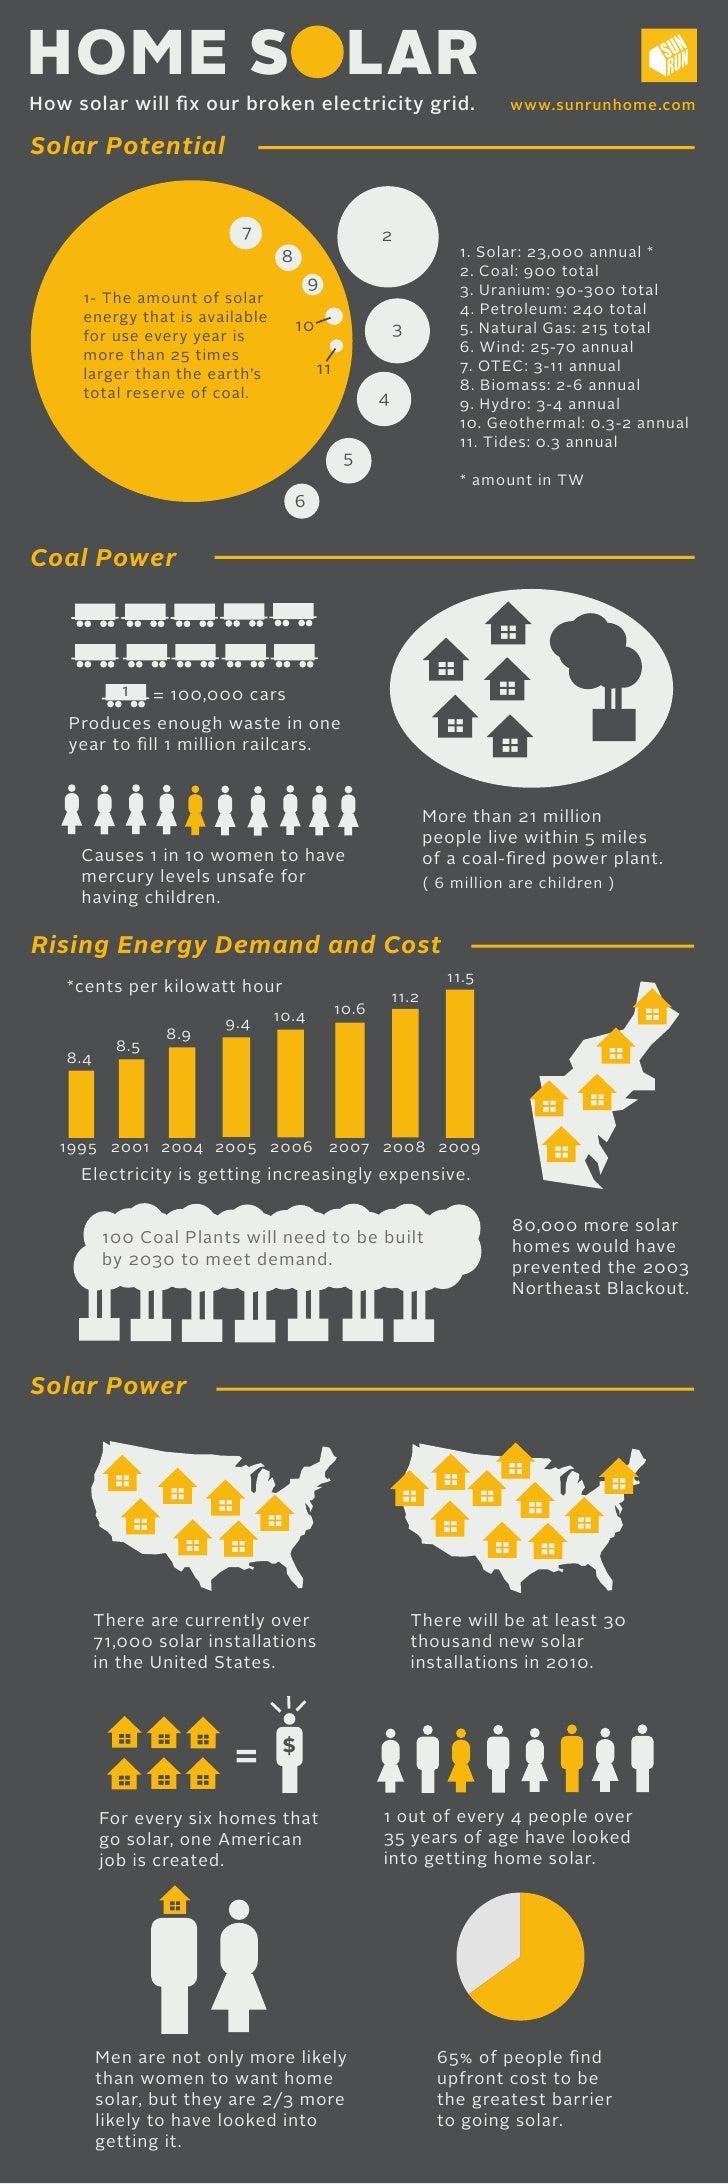 Sun run home solar infographics